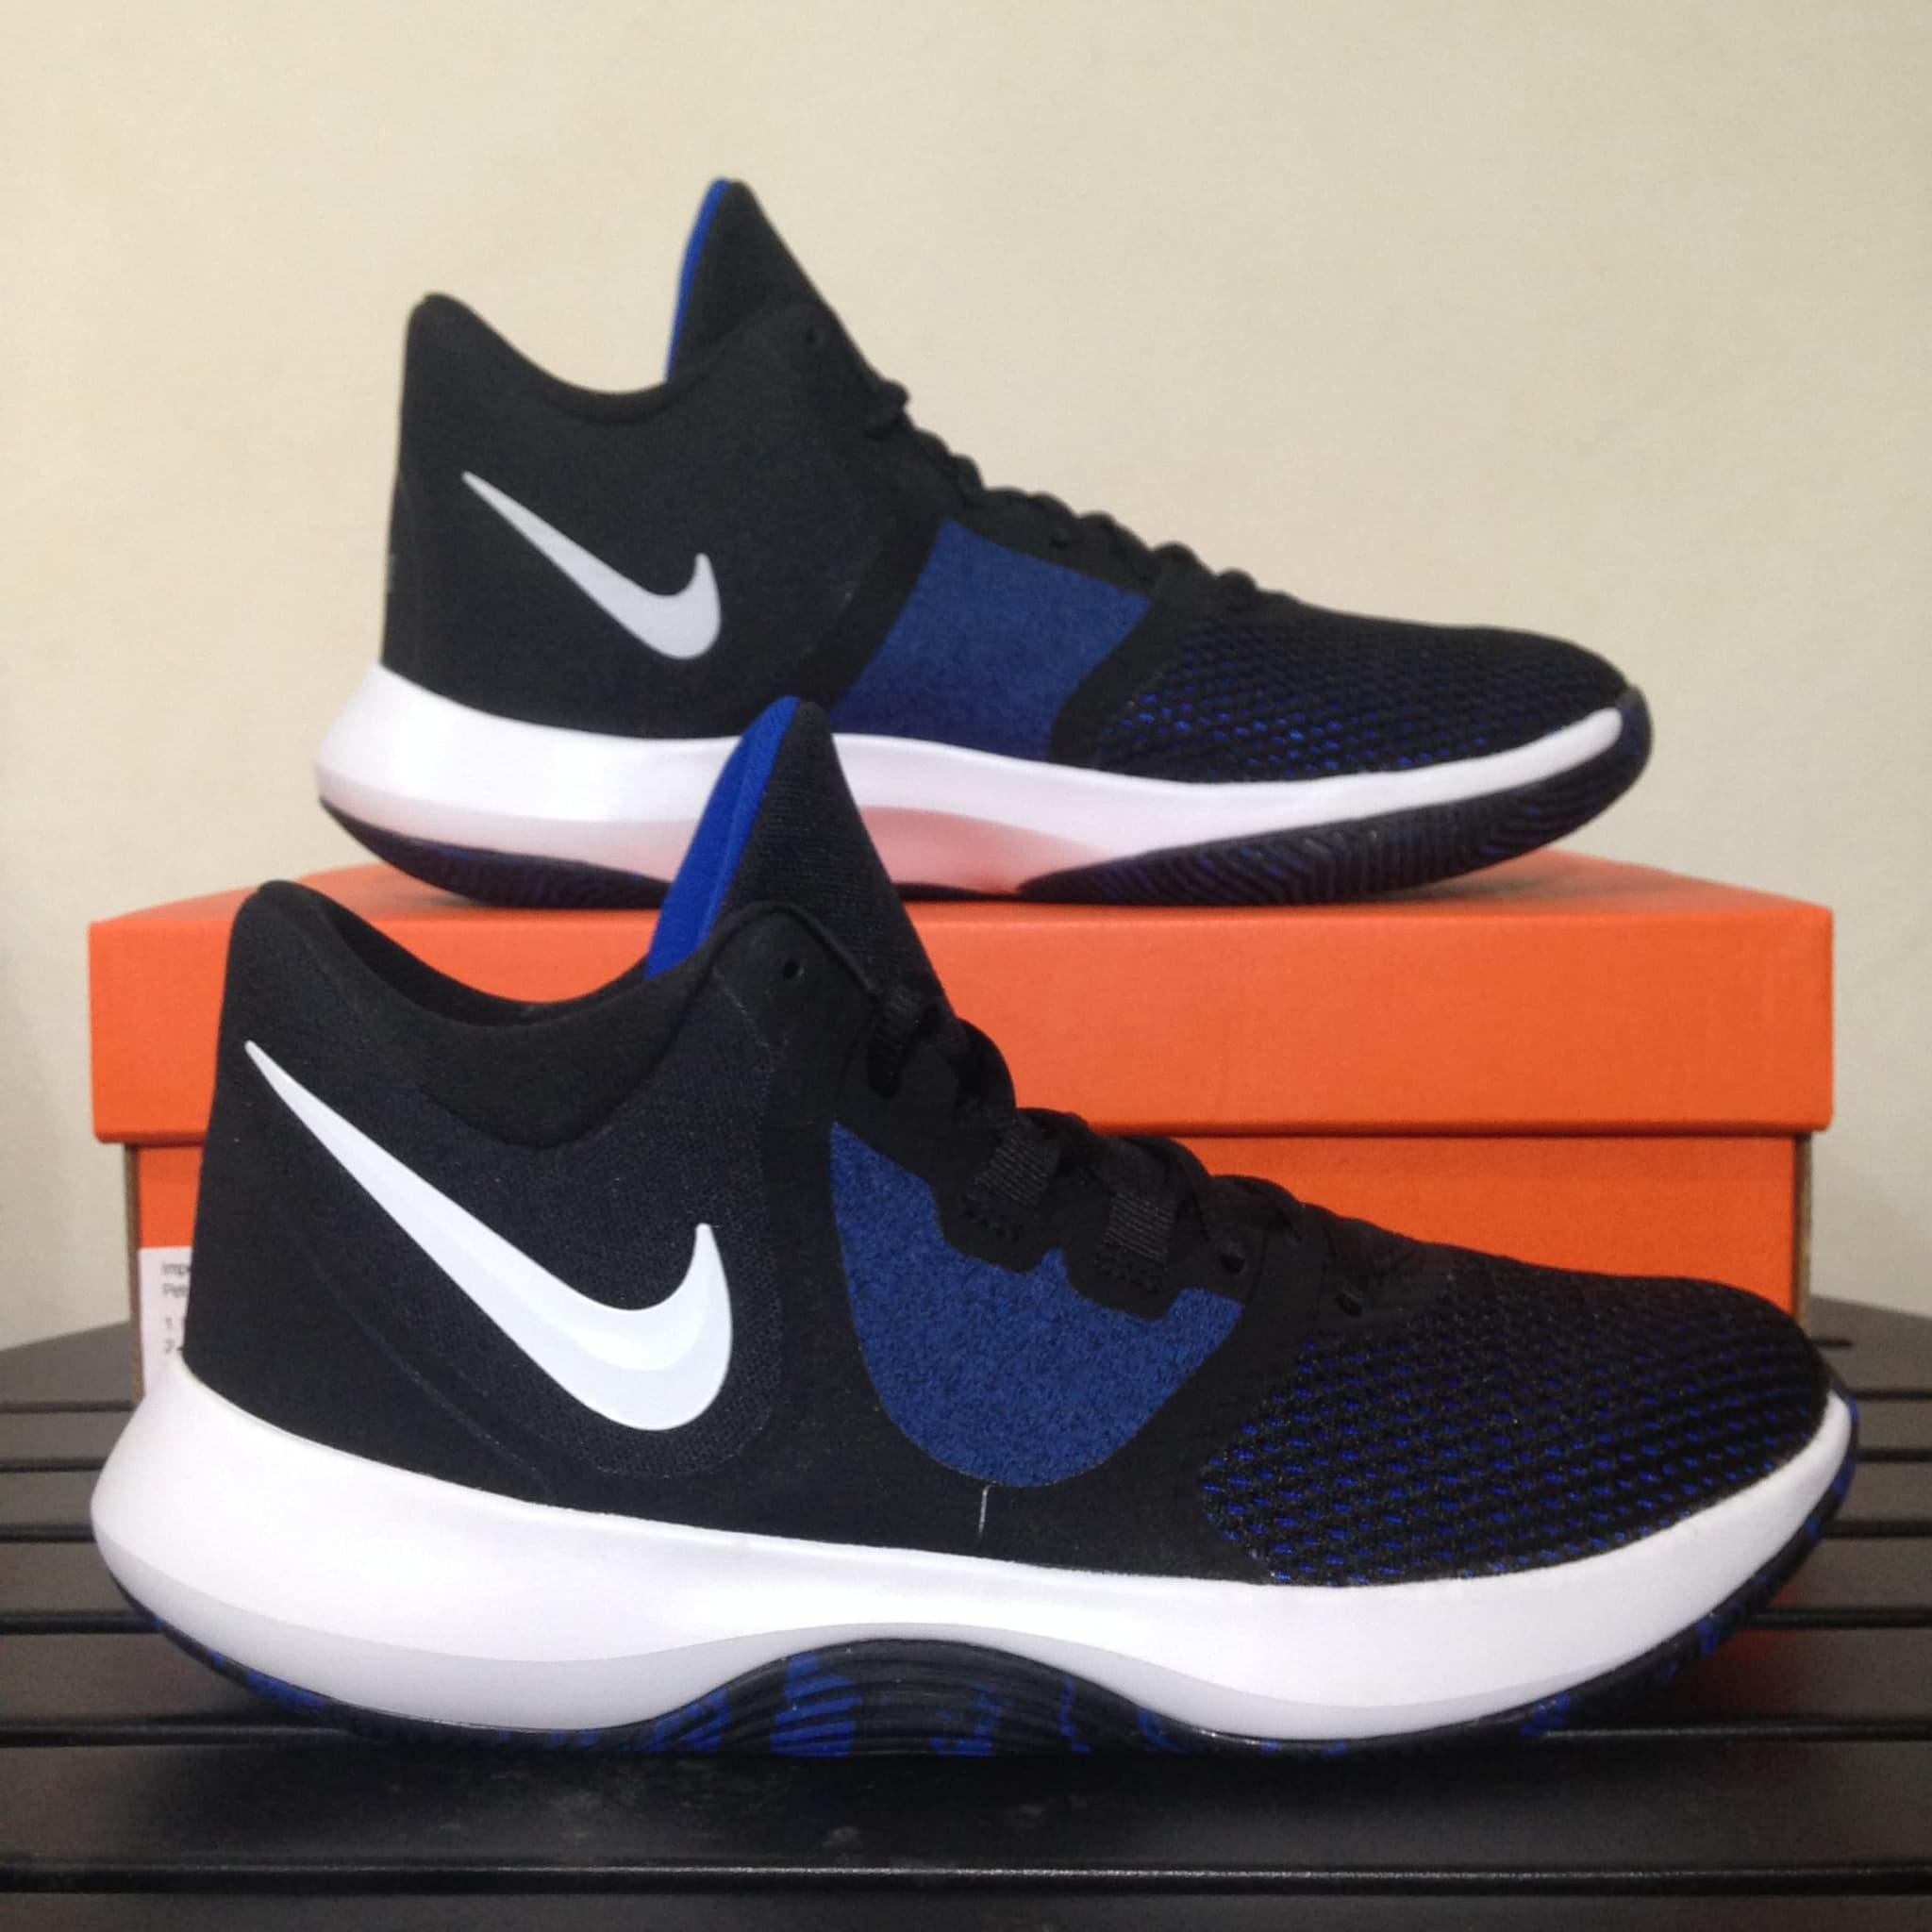 Game Air Sepatu Black Ii Aa7069 Royal Ori Nike 004 Precision Basket OX08nPkwN